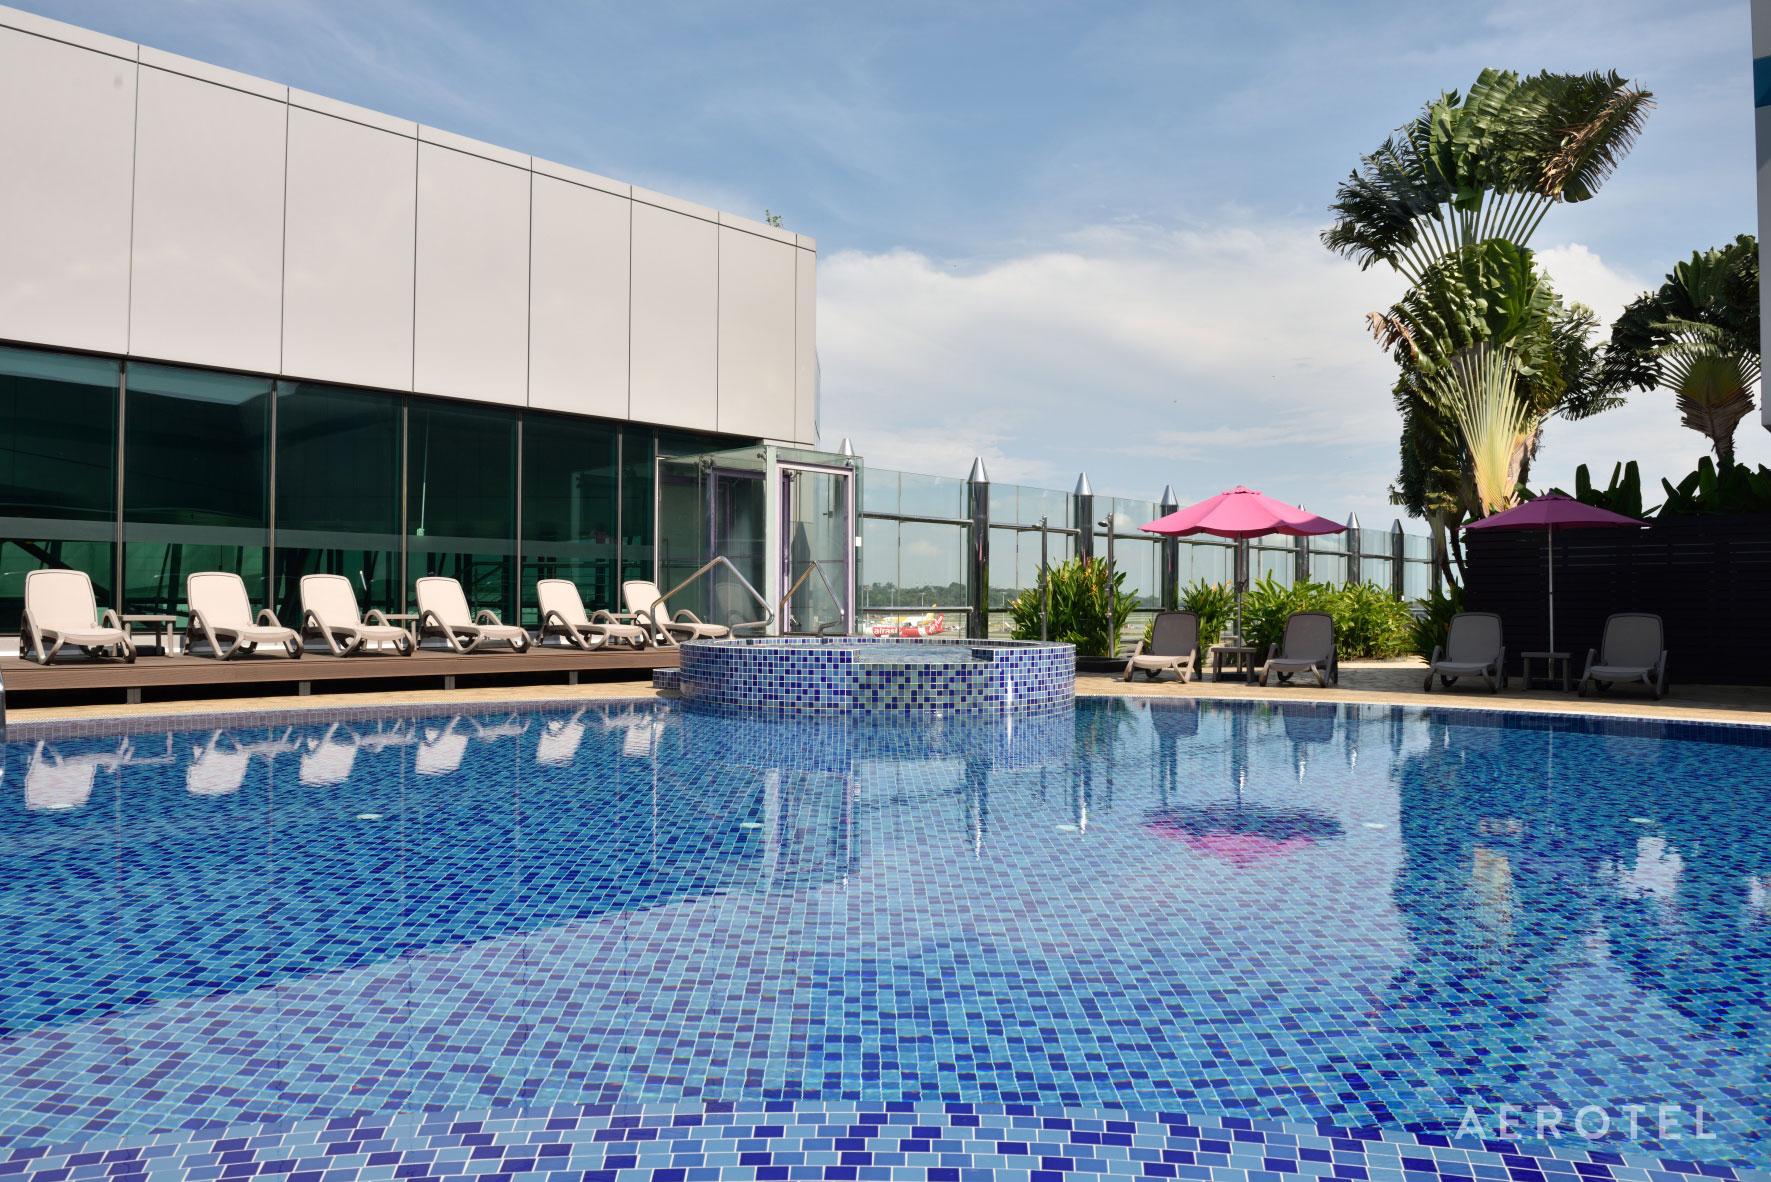 aerotel_swimming-pool